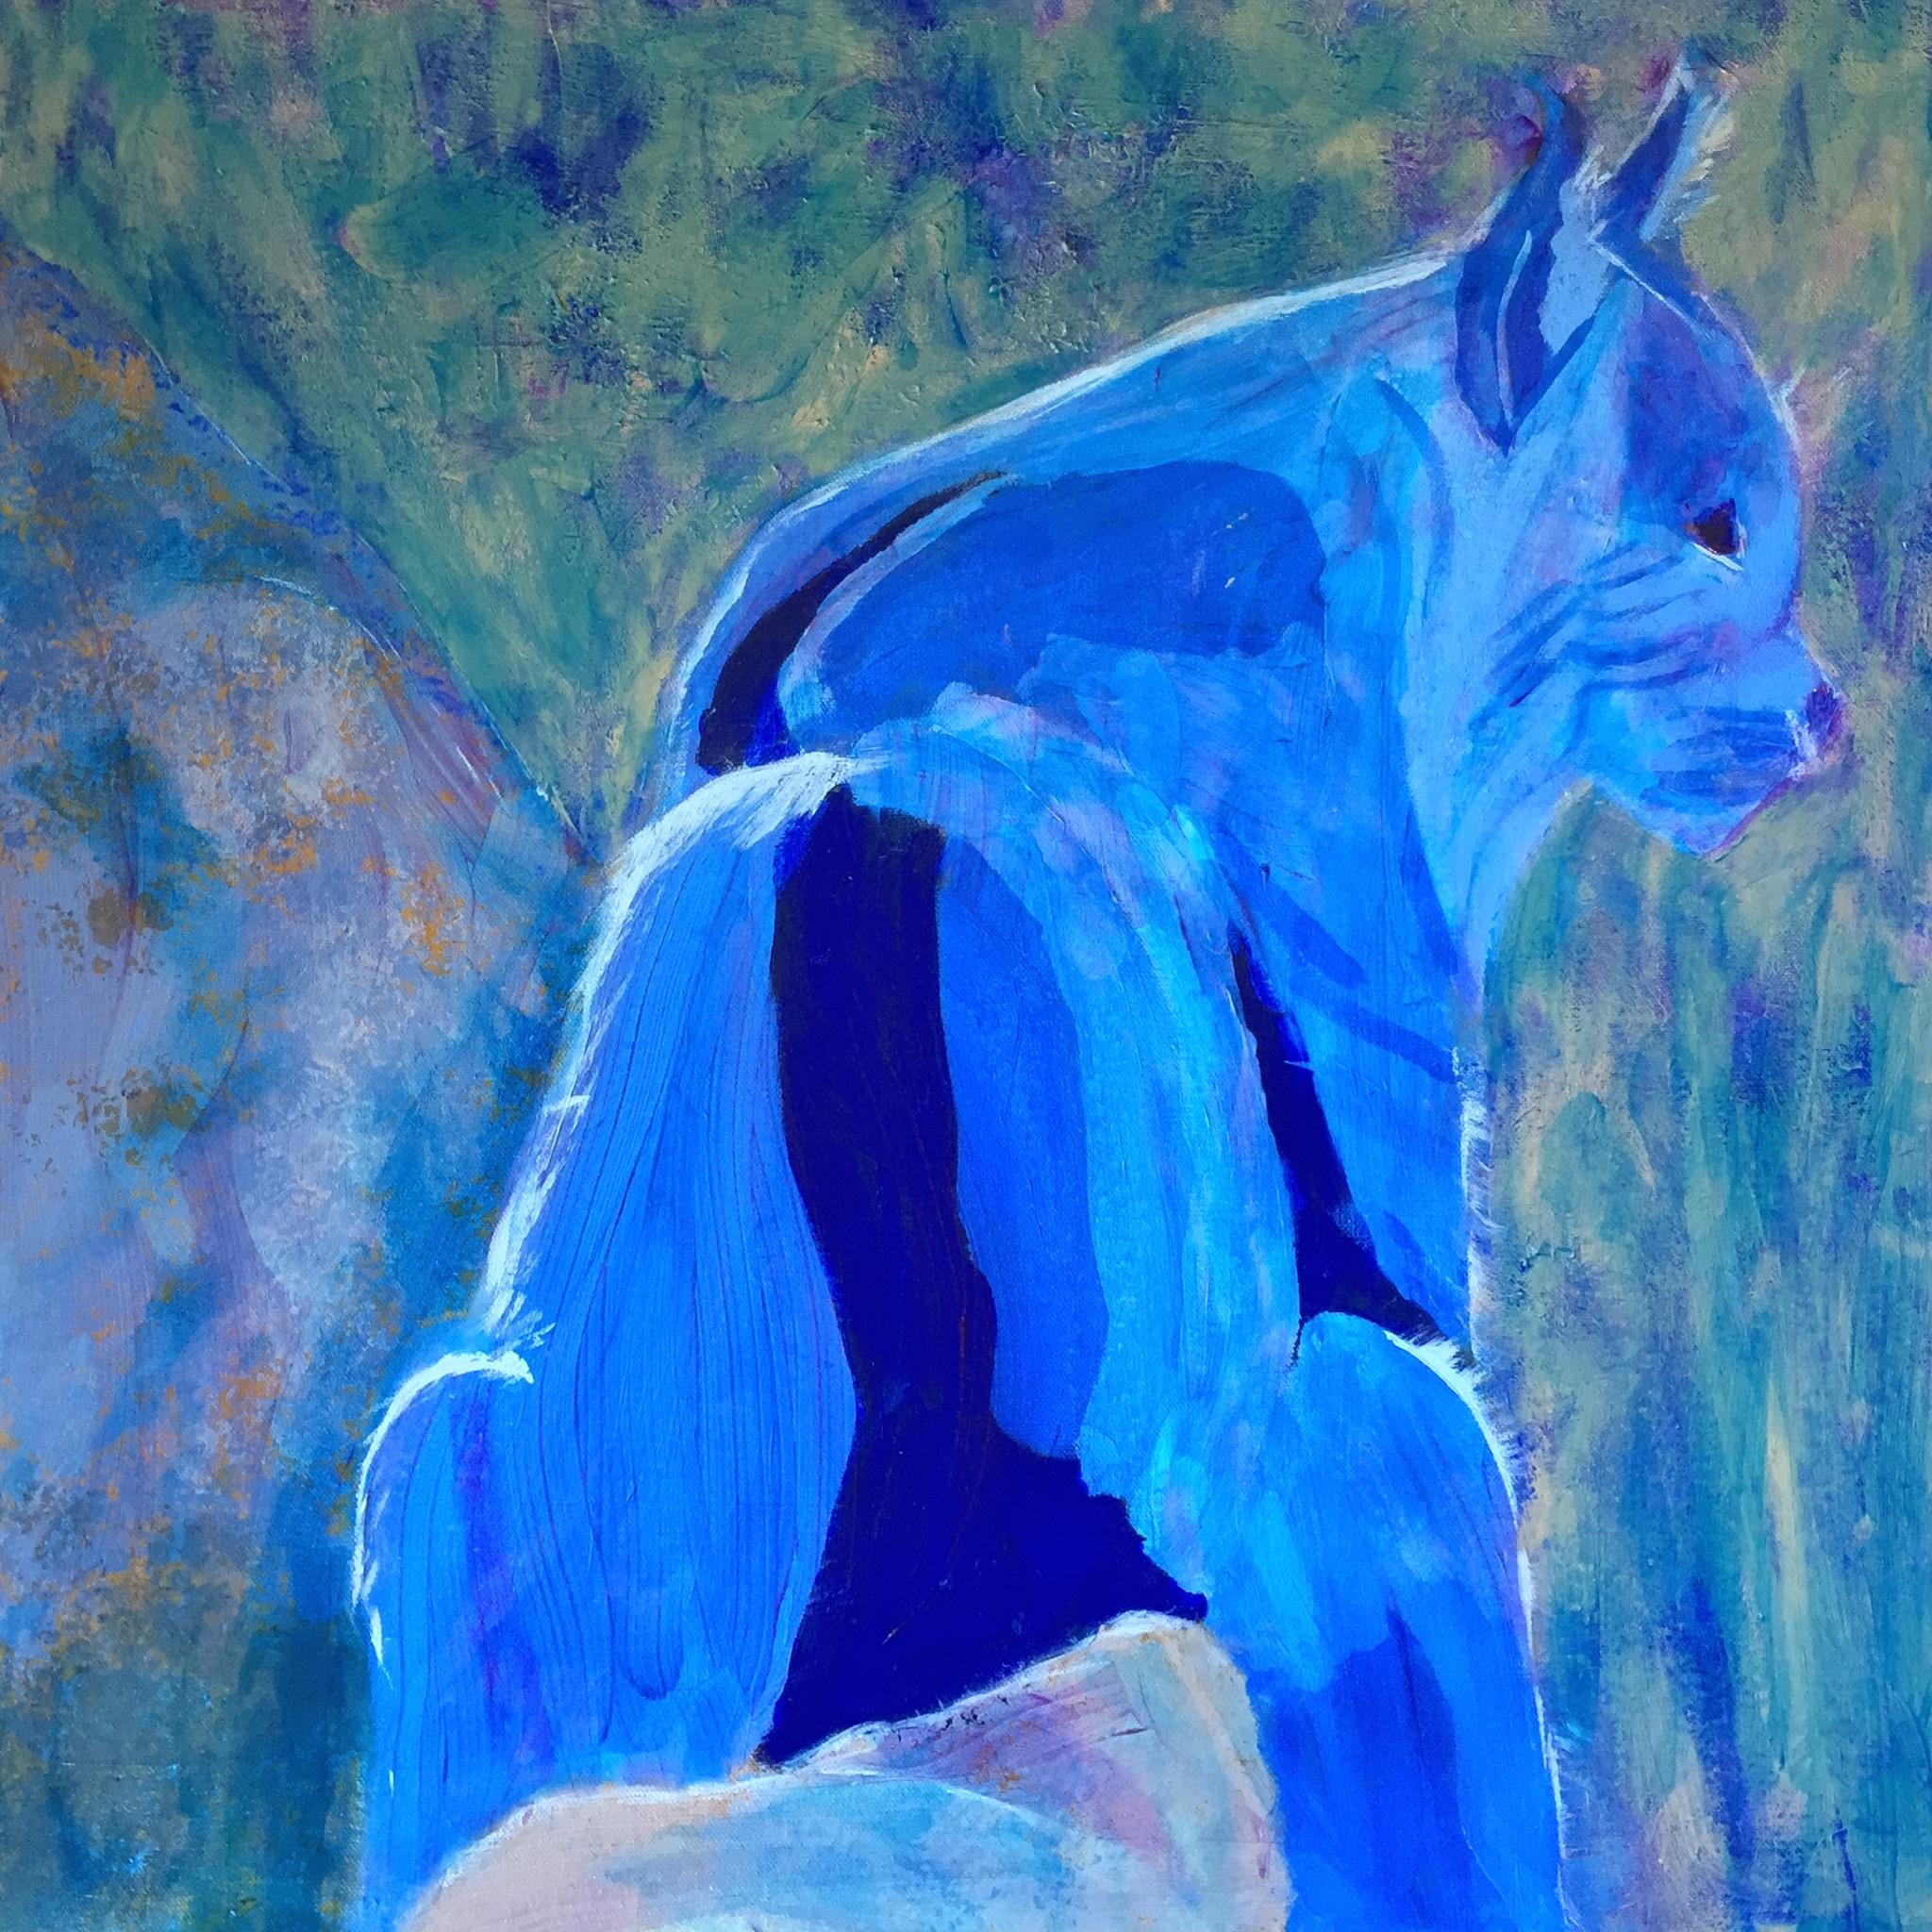 Mountain Bobcat - Original for Sale - Prints Available